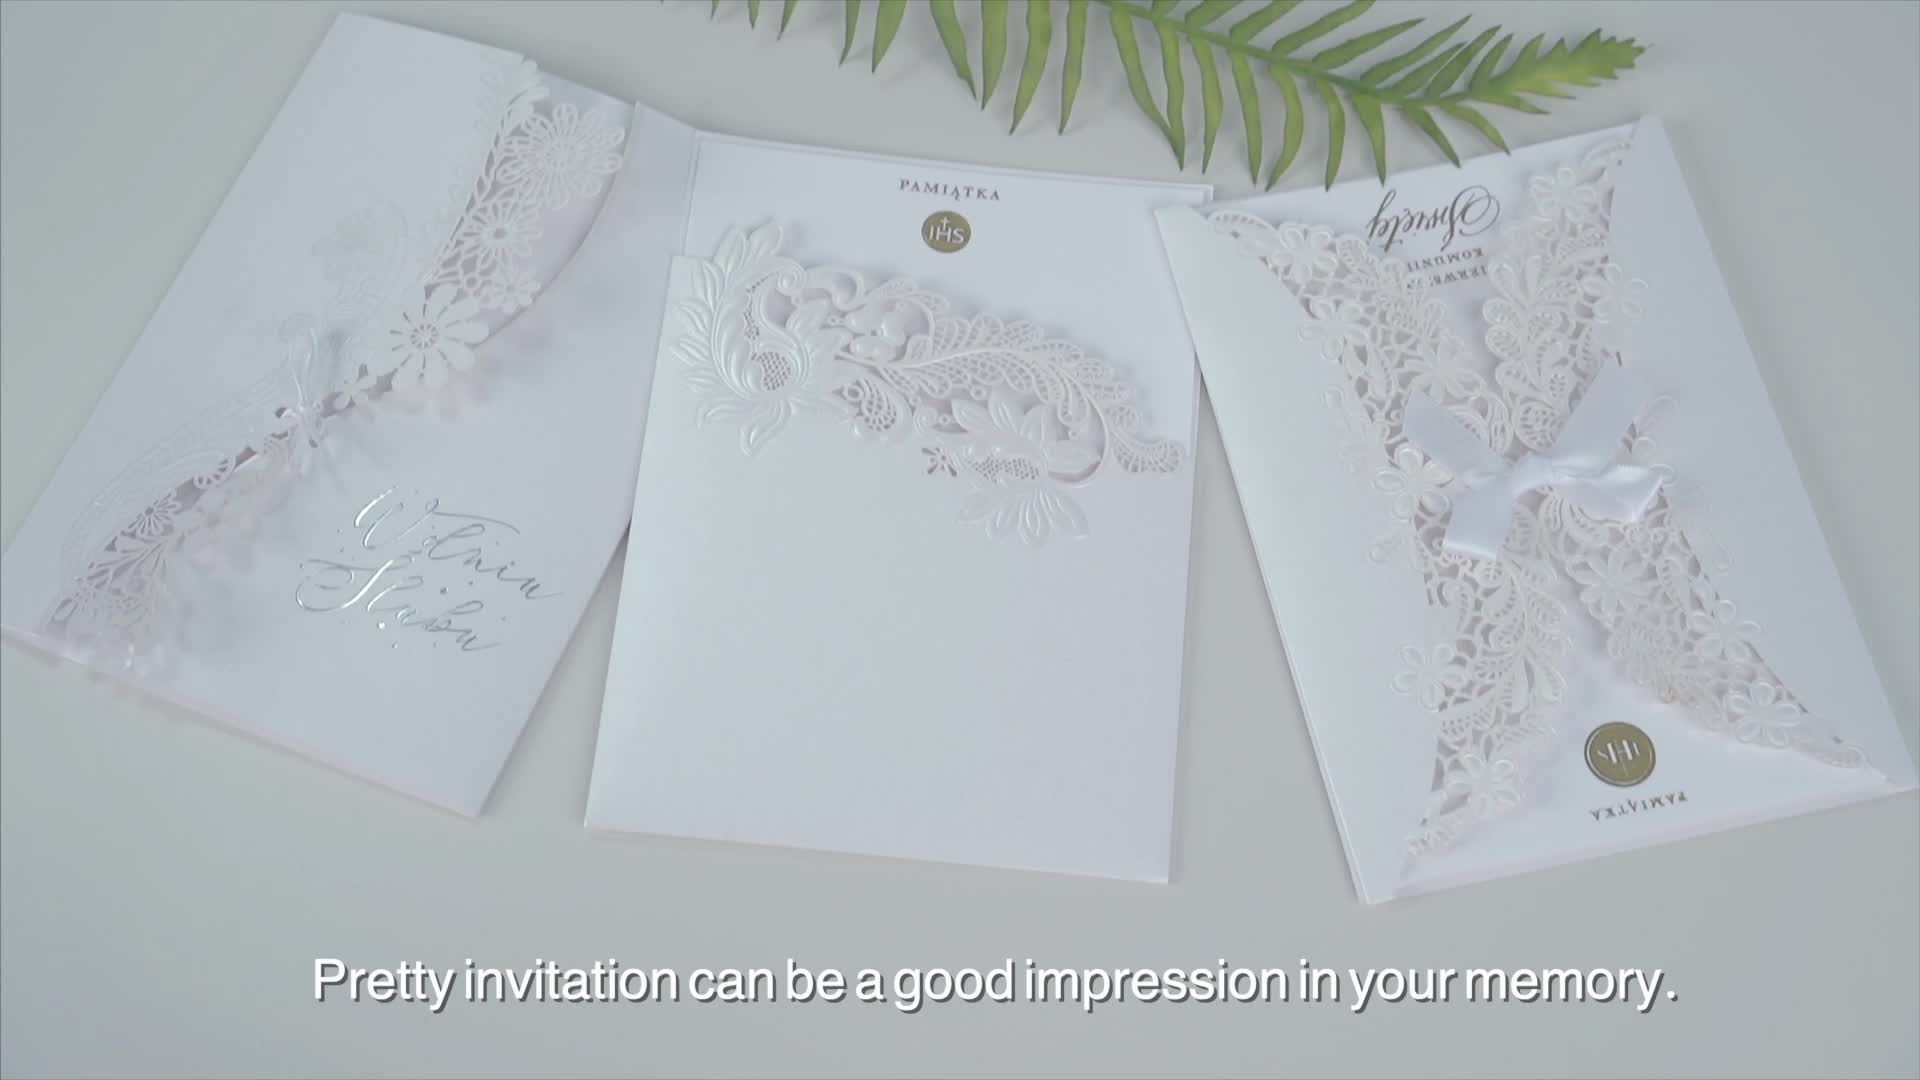 cartões de convite de casamento de luxo convites de casamento baratos que decoram convites de casamento